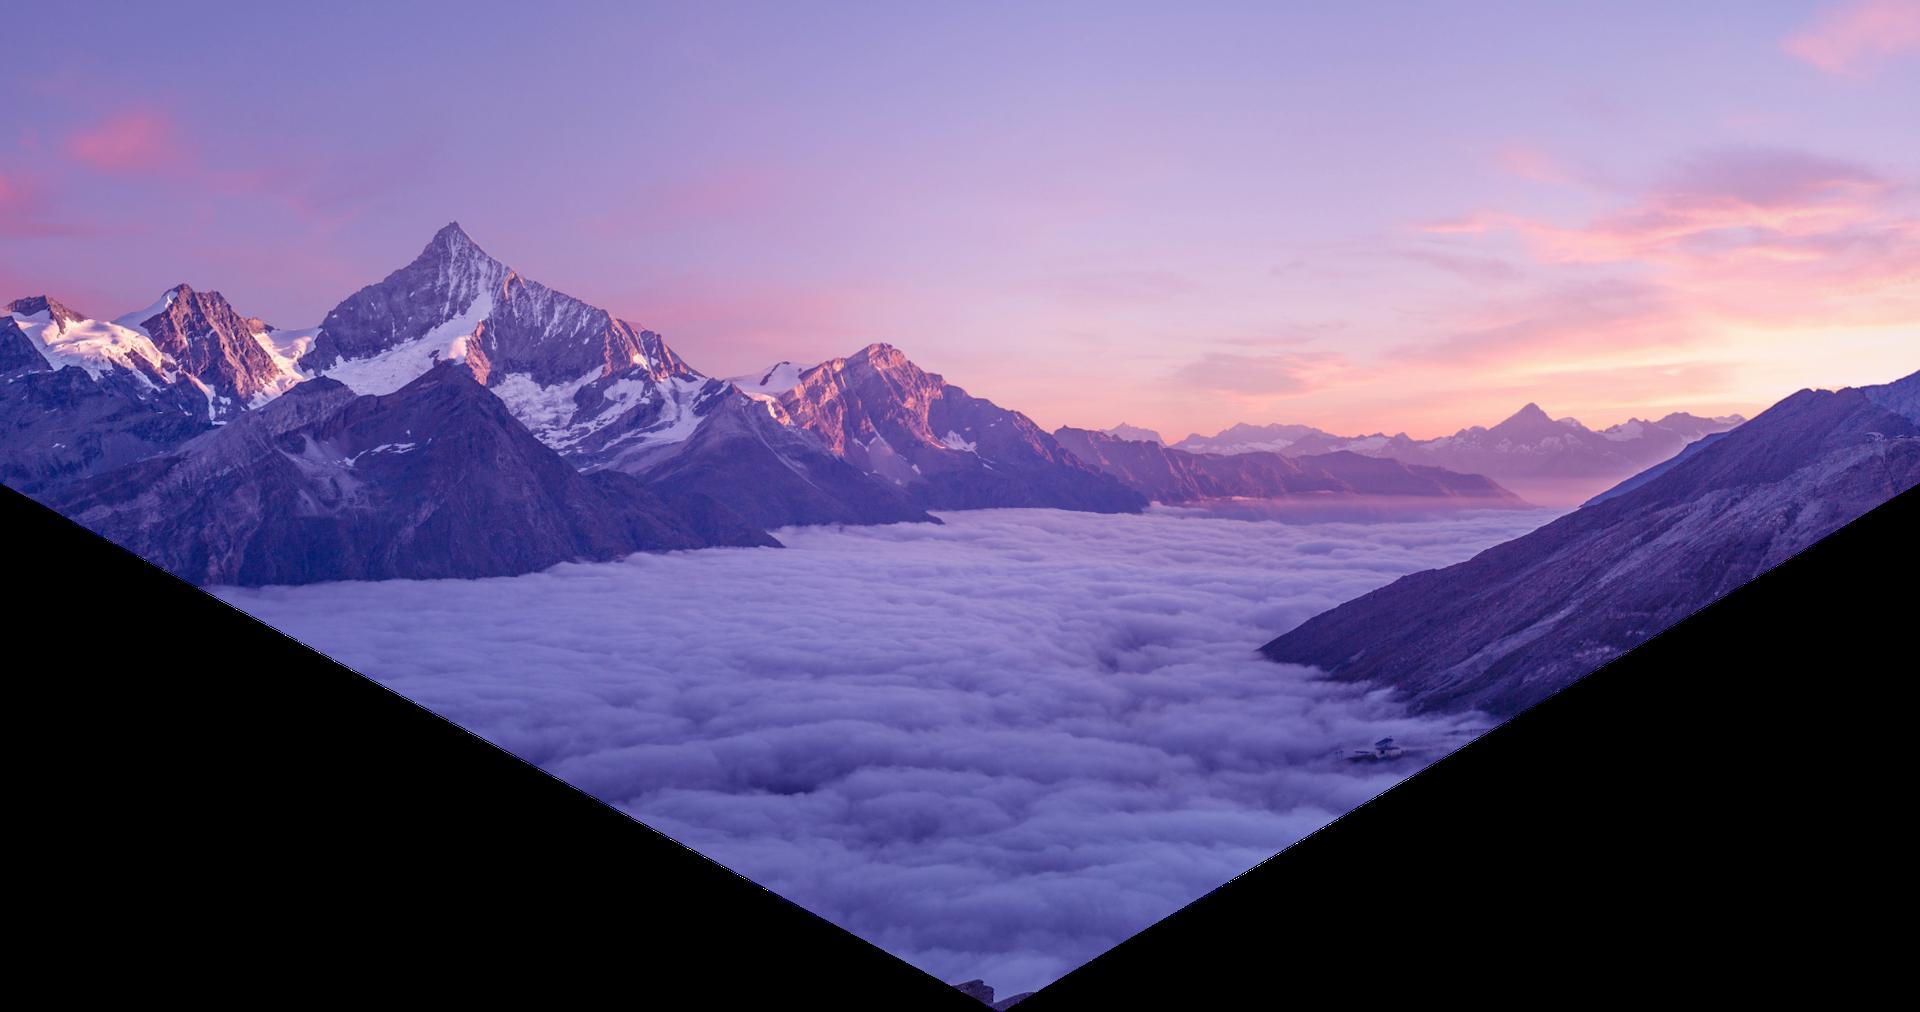 Hero image of mountains